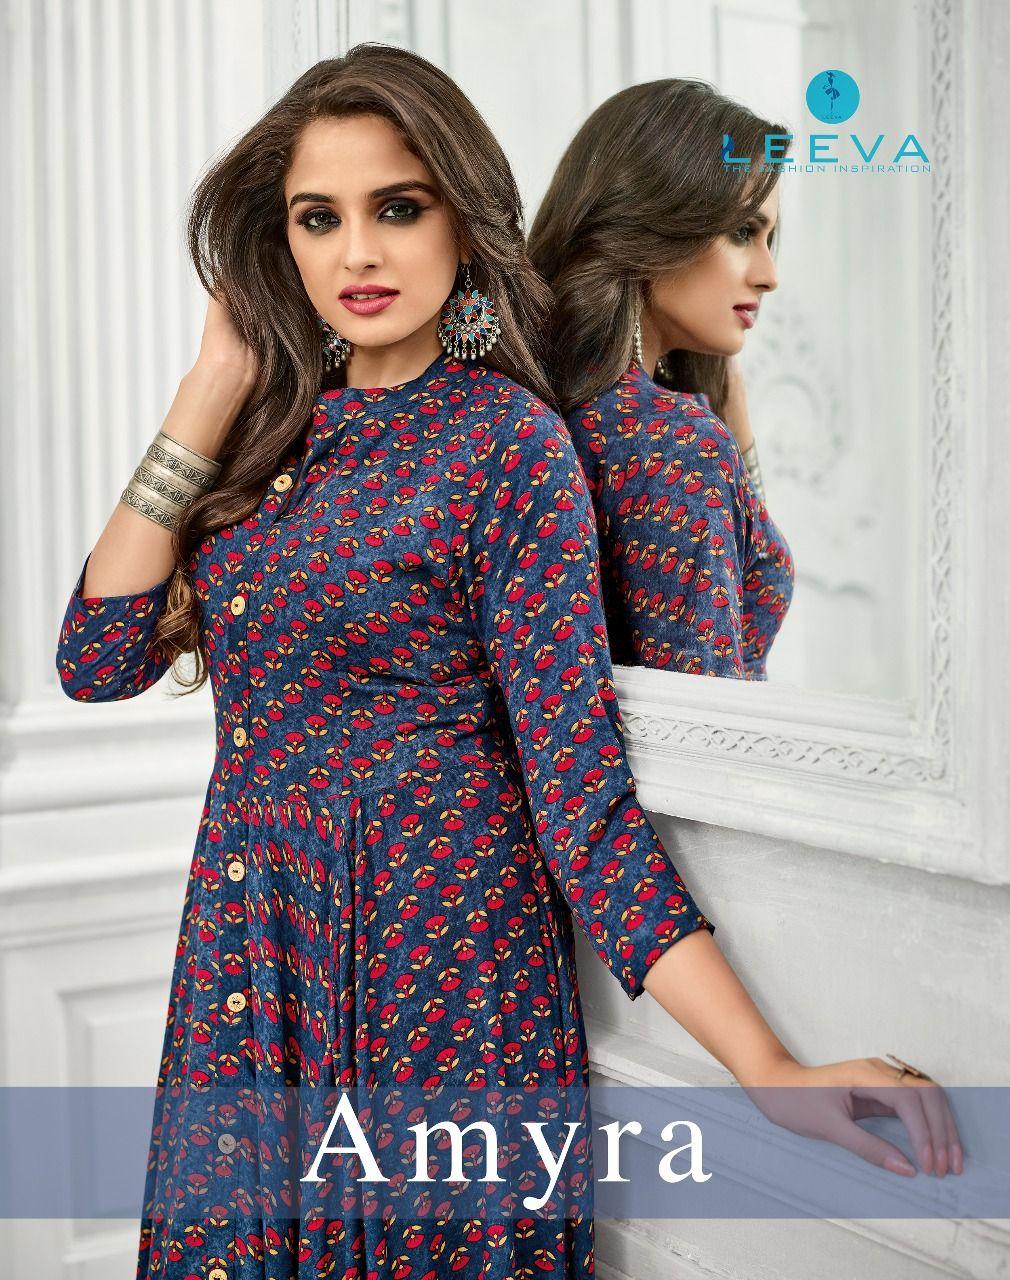 Leeva Amyra Heavy Rayon print Gown Wholesale(6 Pc Set)  7e88c91f7